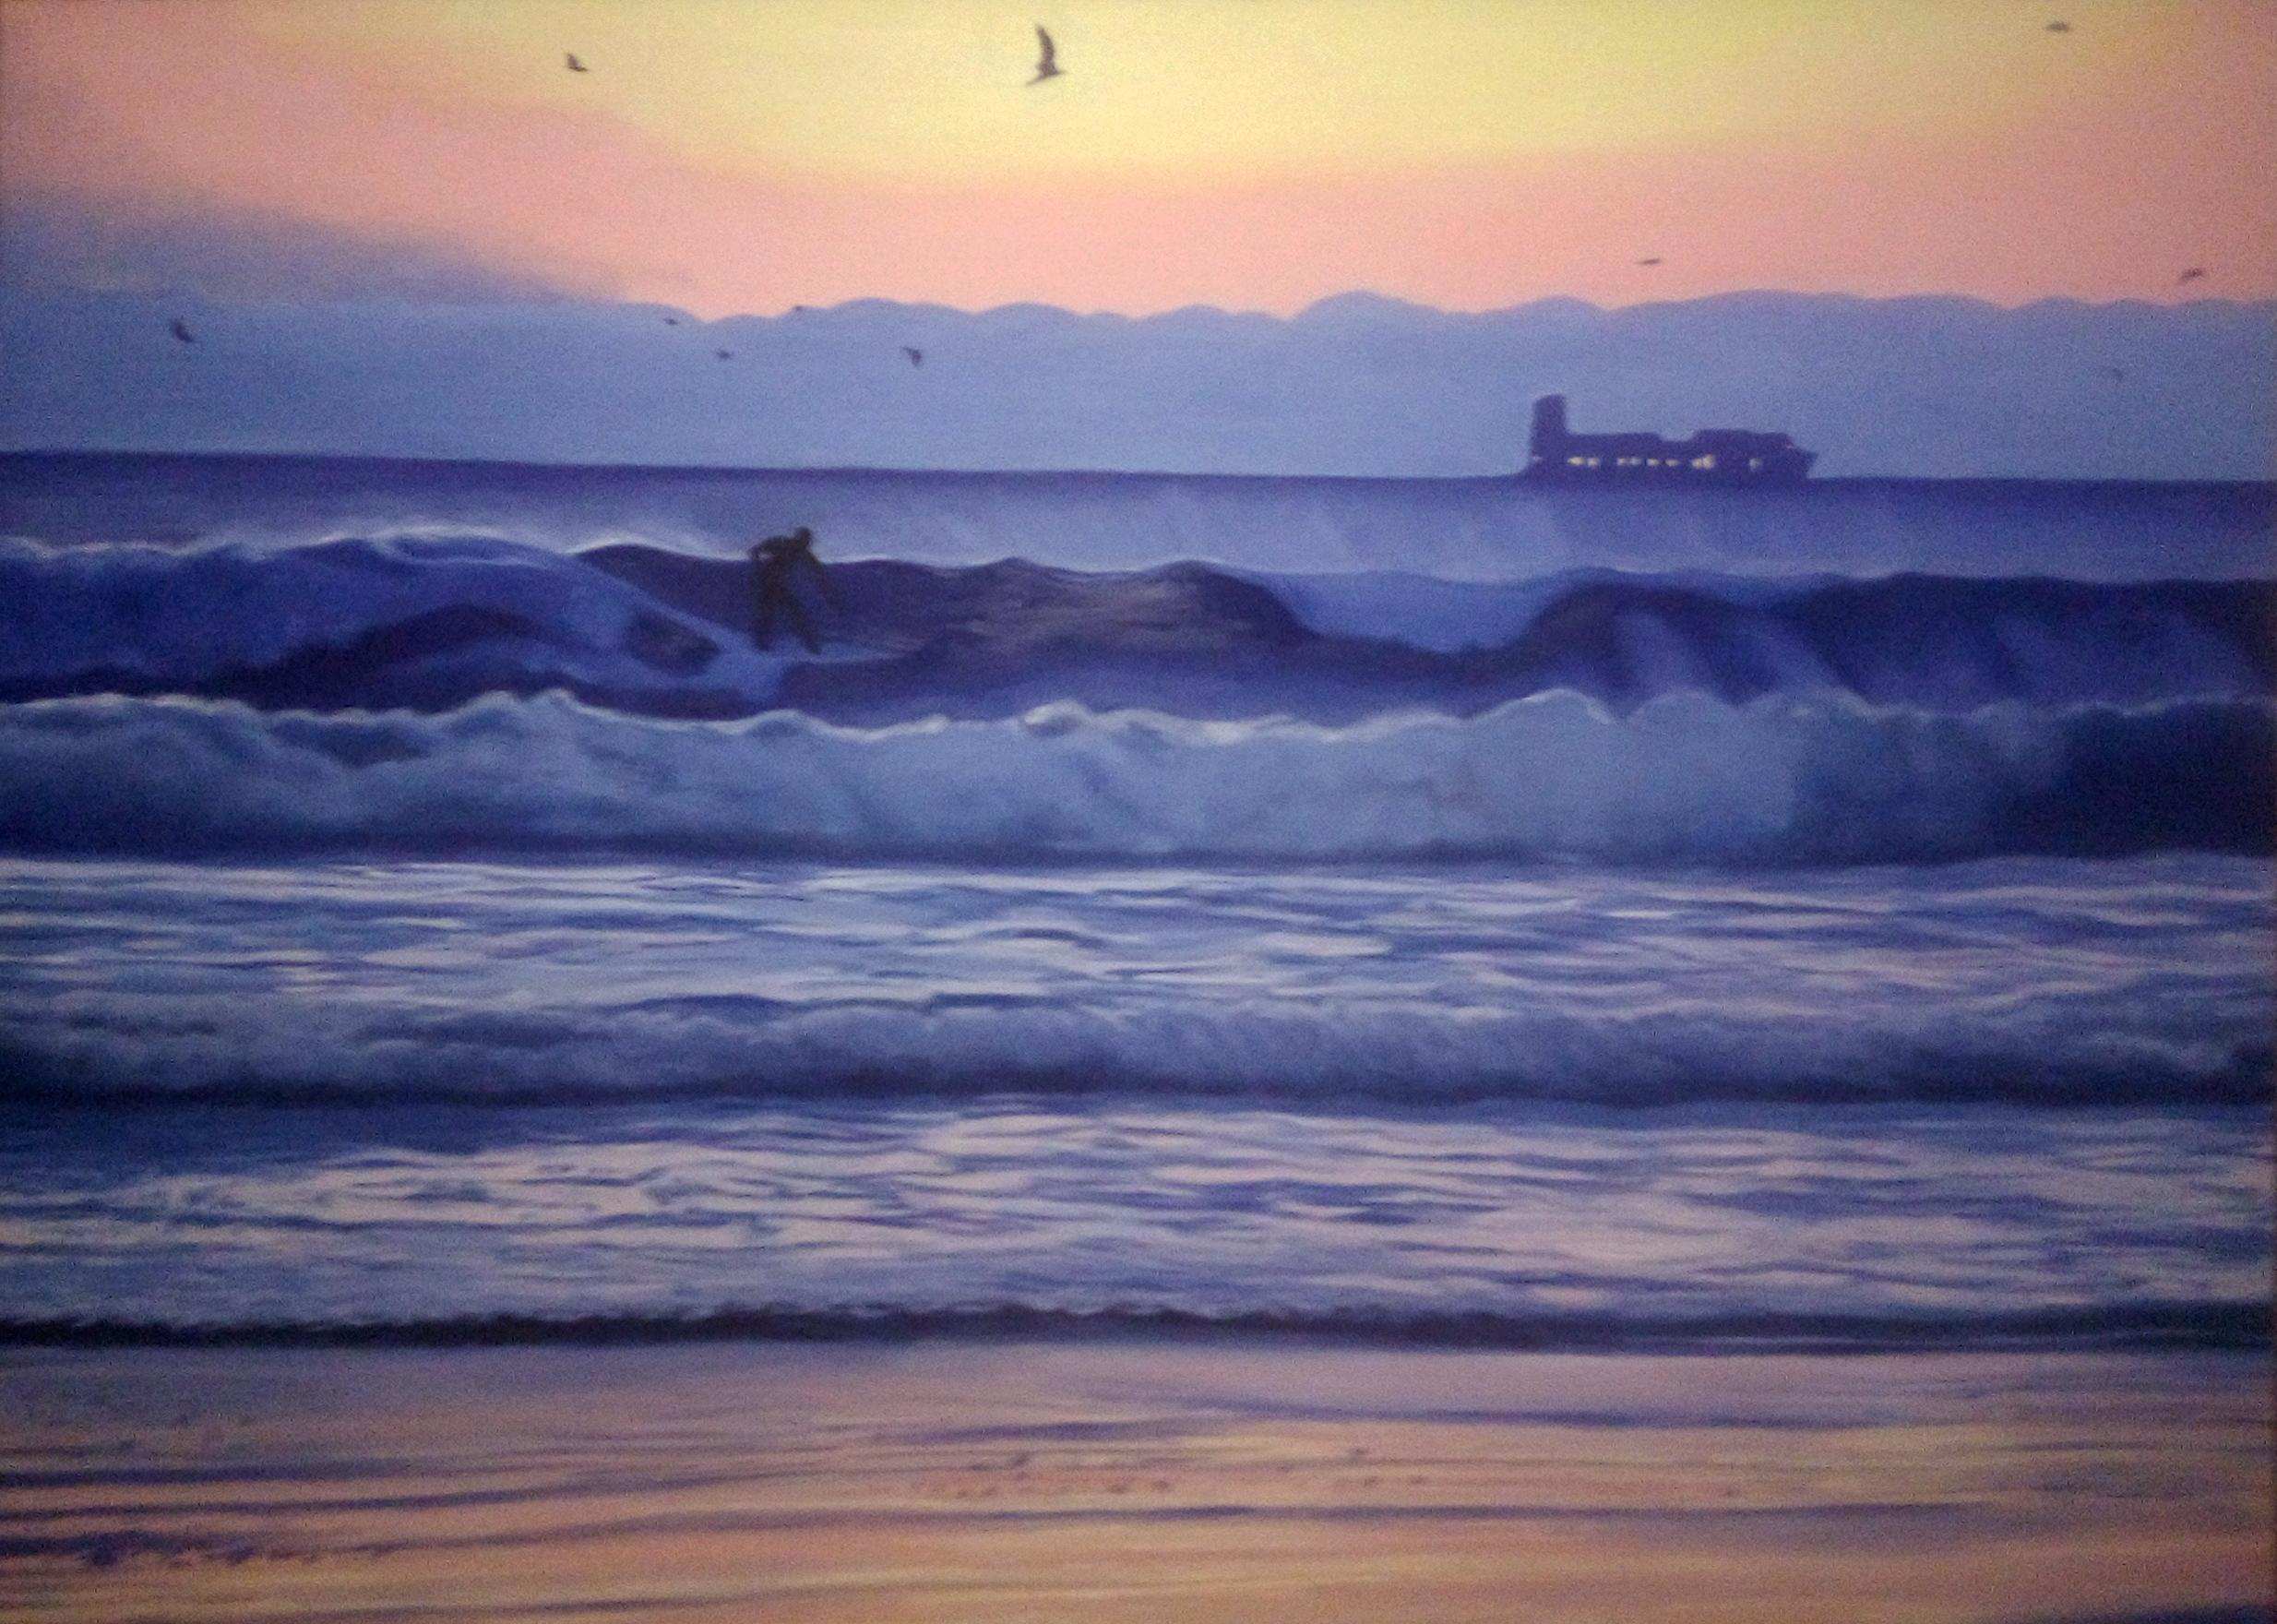 The Sunset Surf